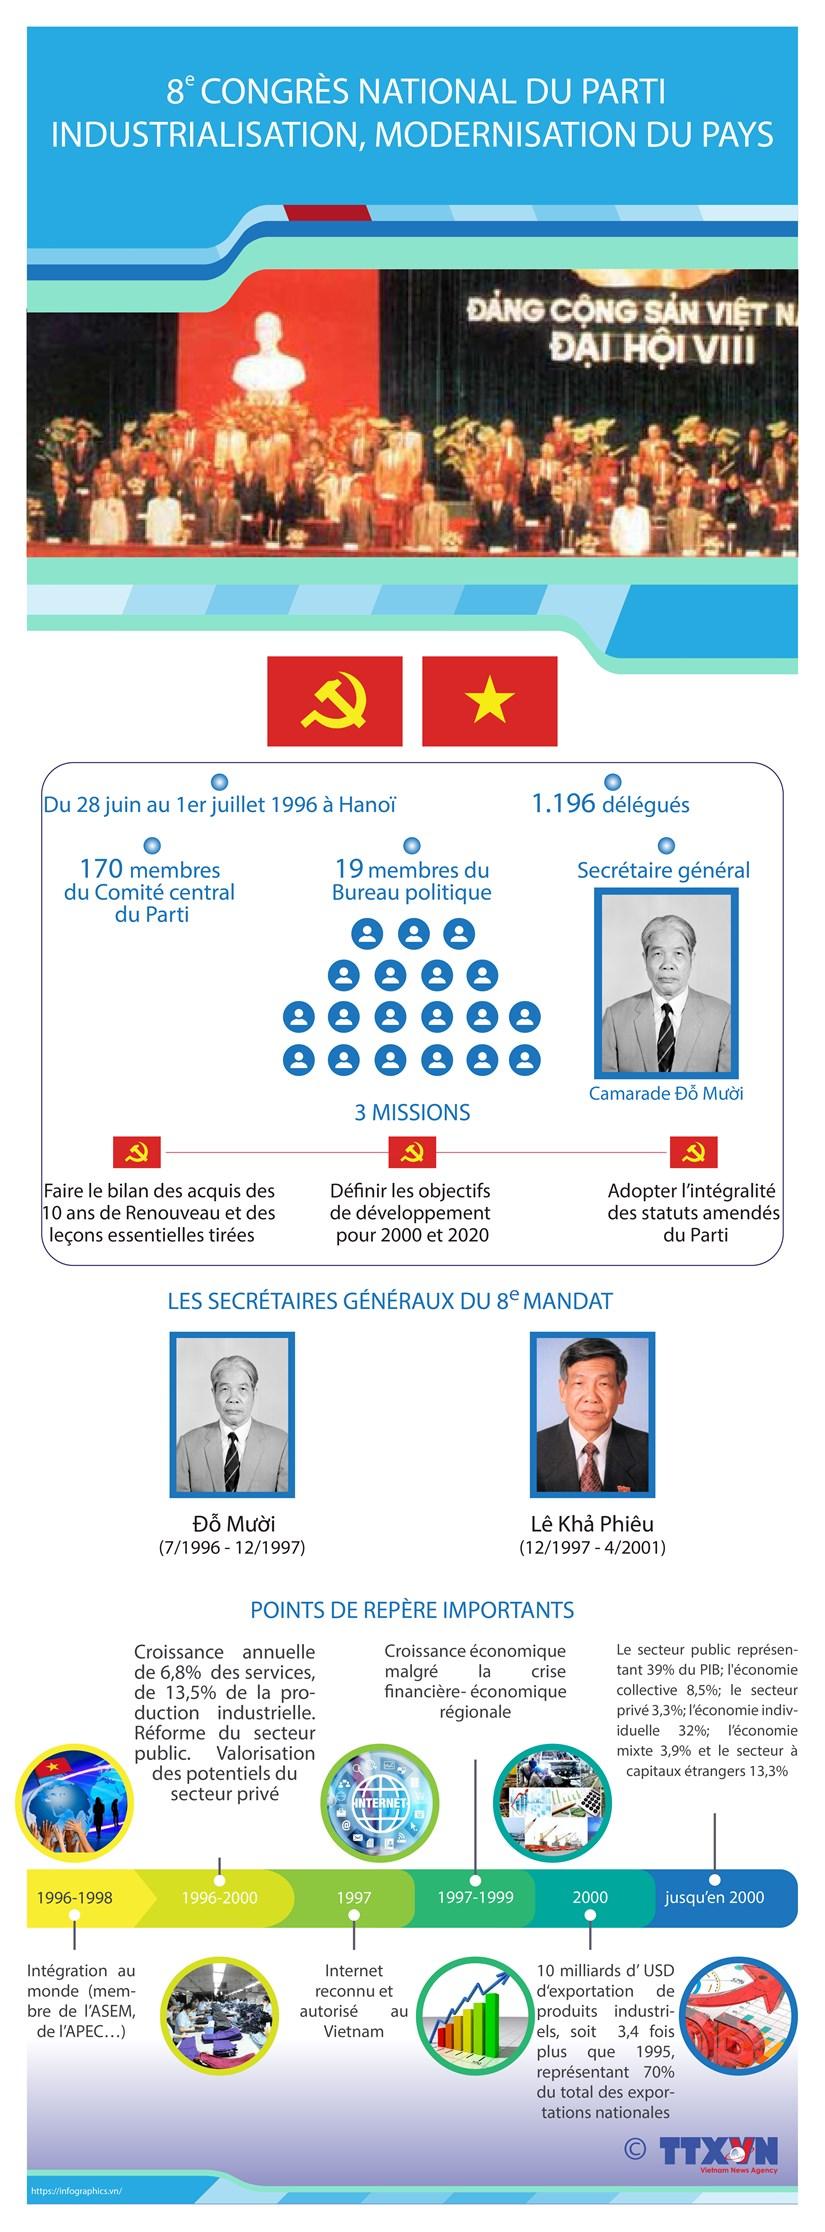 8e Congres national du Parti : Industrialisation, modernisation du pays hinh anh 1